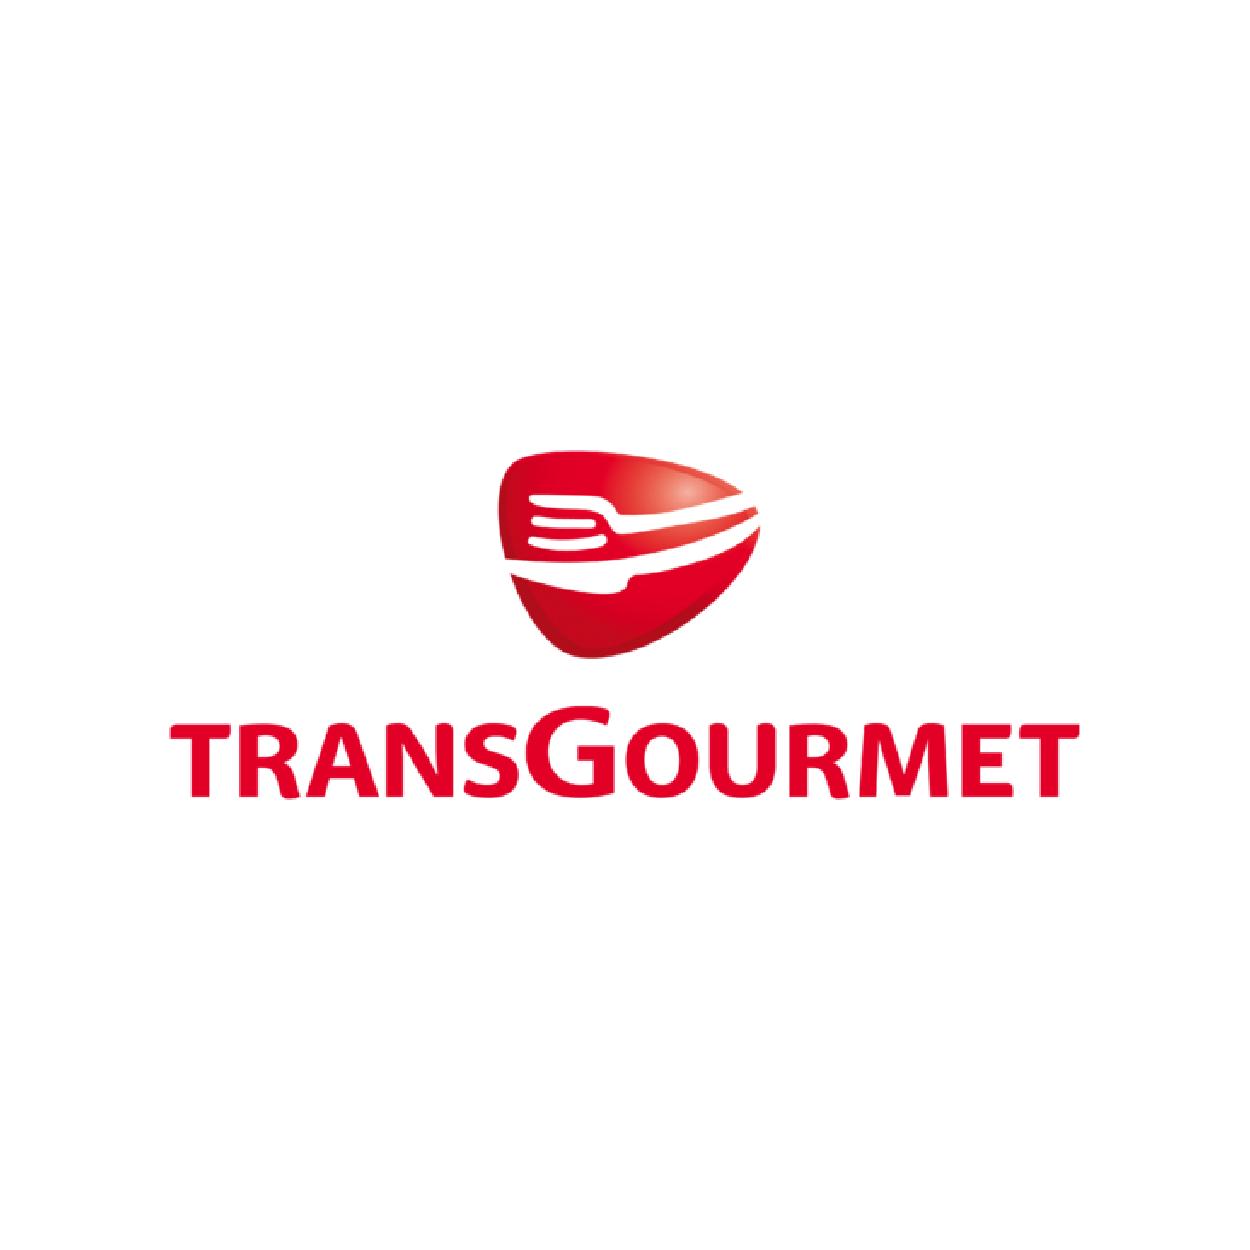 transgourmet_Plan de travail 1